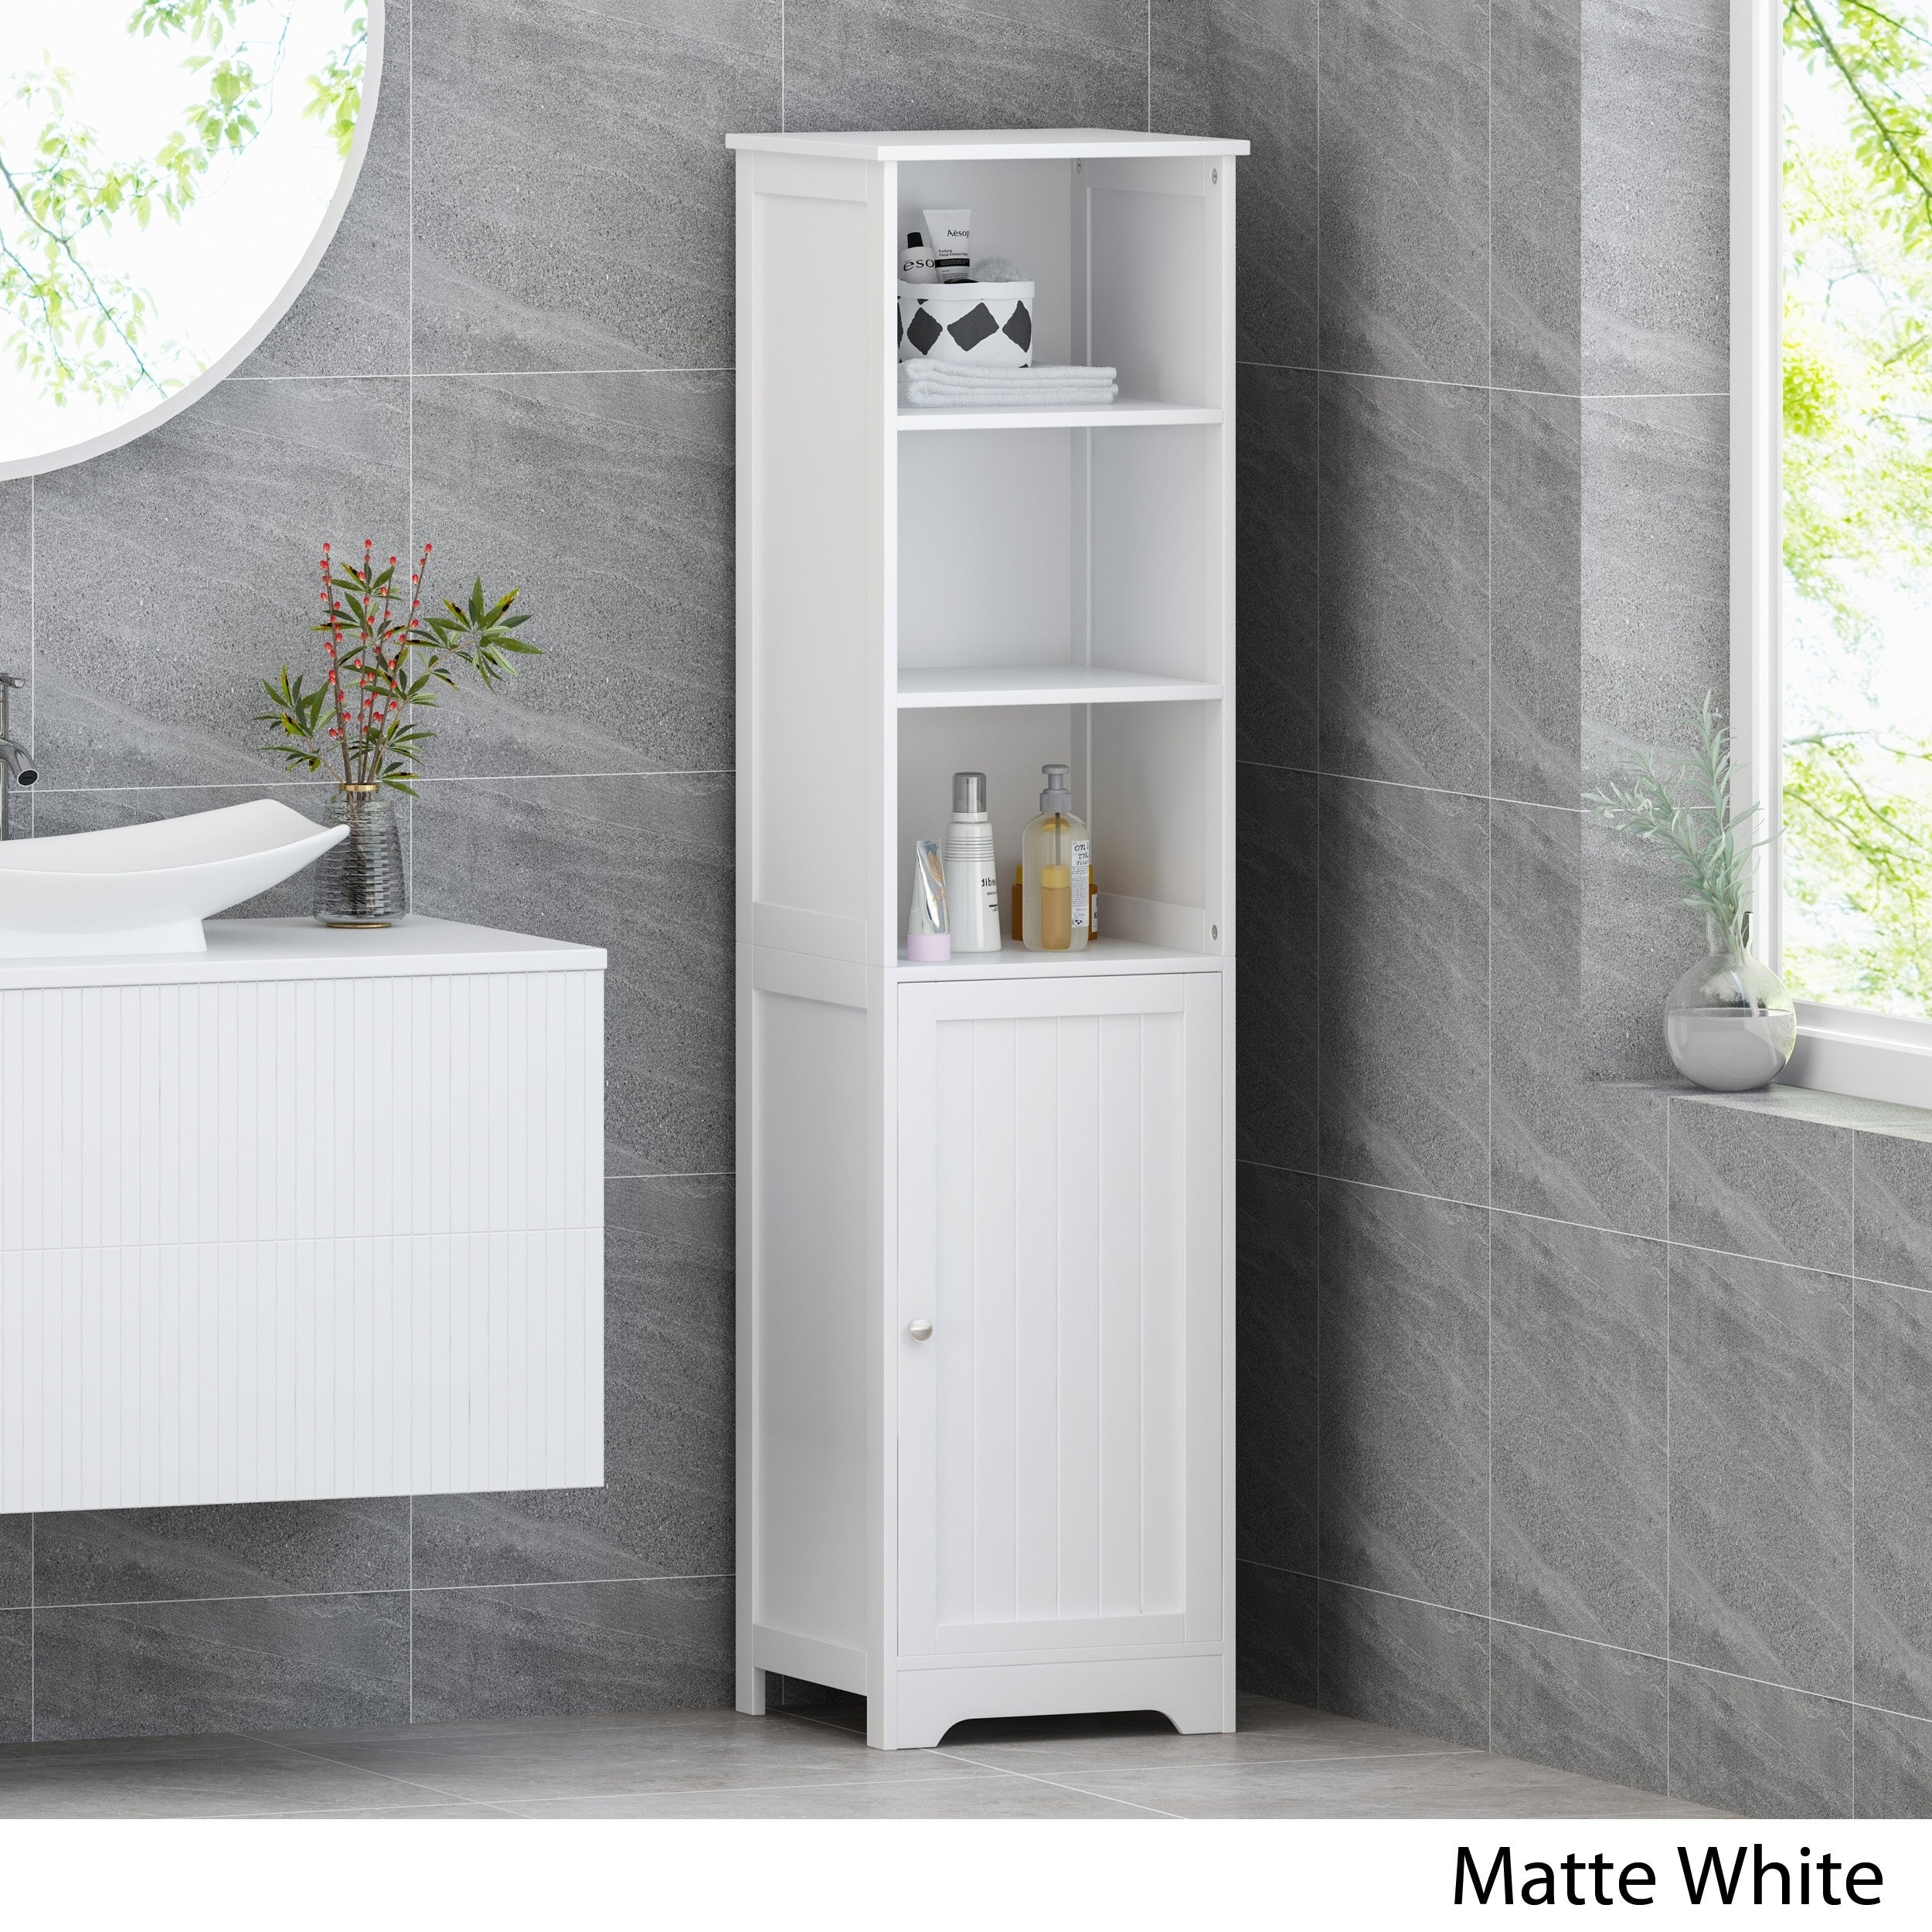 Free Standing Bathroom Linen Tower